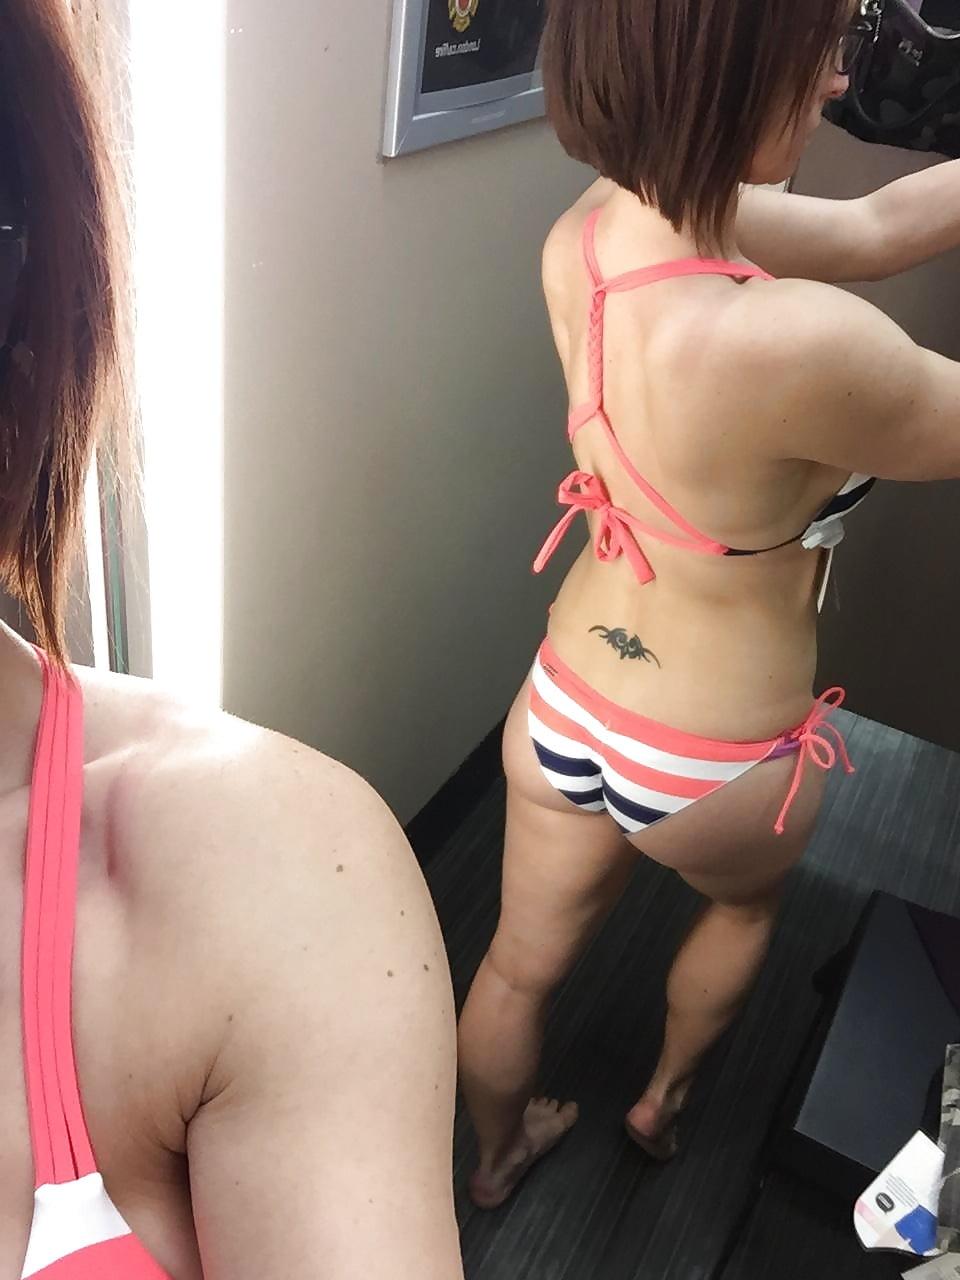 dressing room bikini